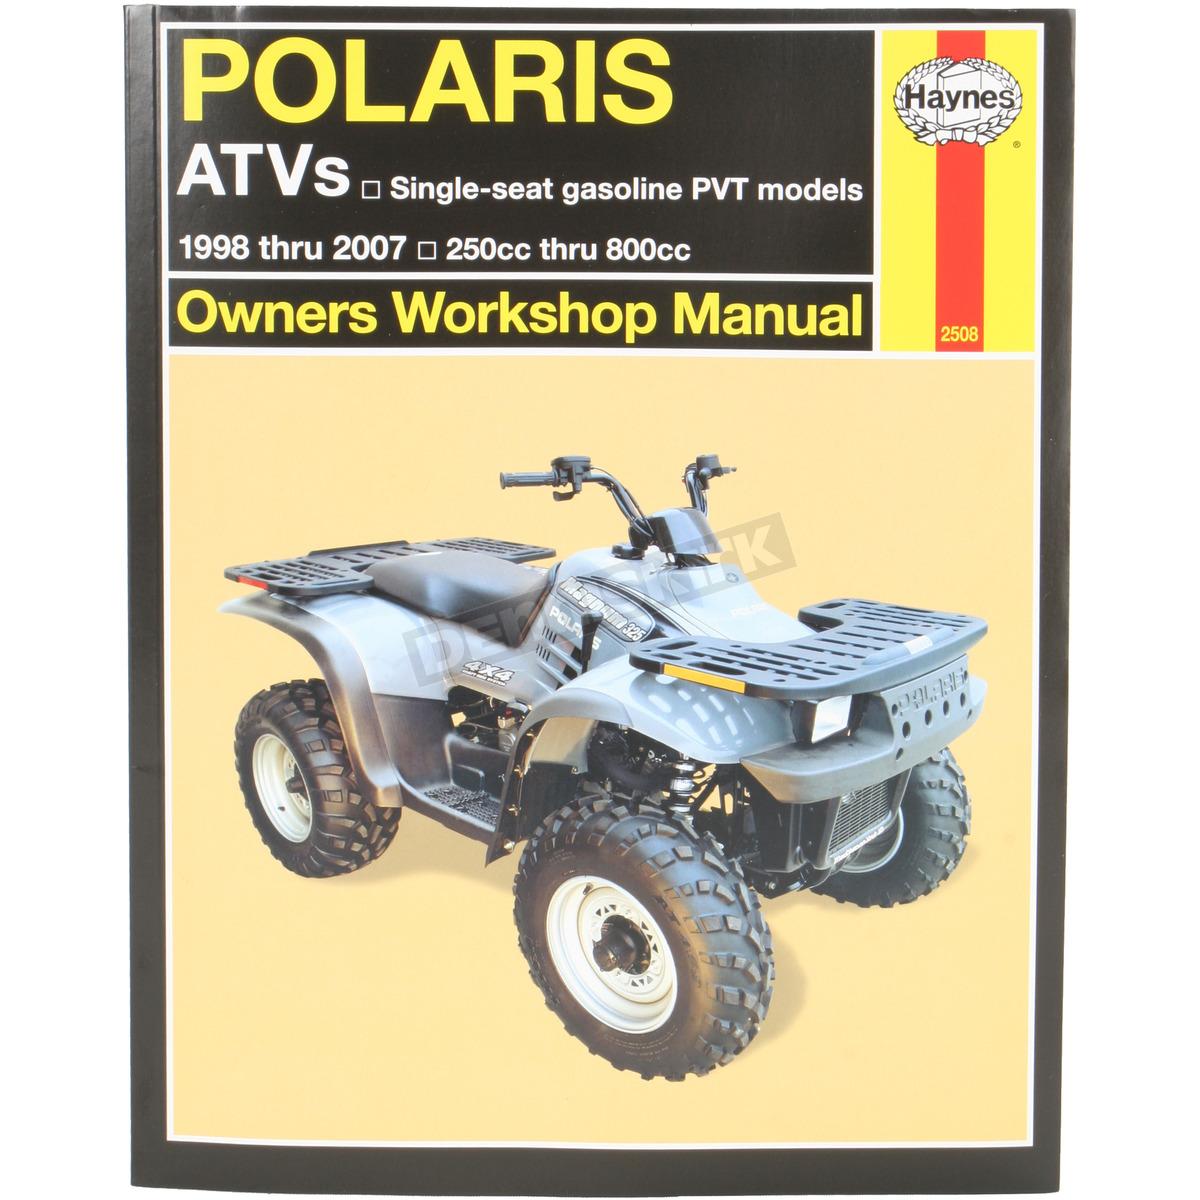 polaris scrambler 500 service manual motorjdi co rh motorjdi co polaris sportsman 500 ho repair manual 2005 polaris sportsman 500 ho owner's manual